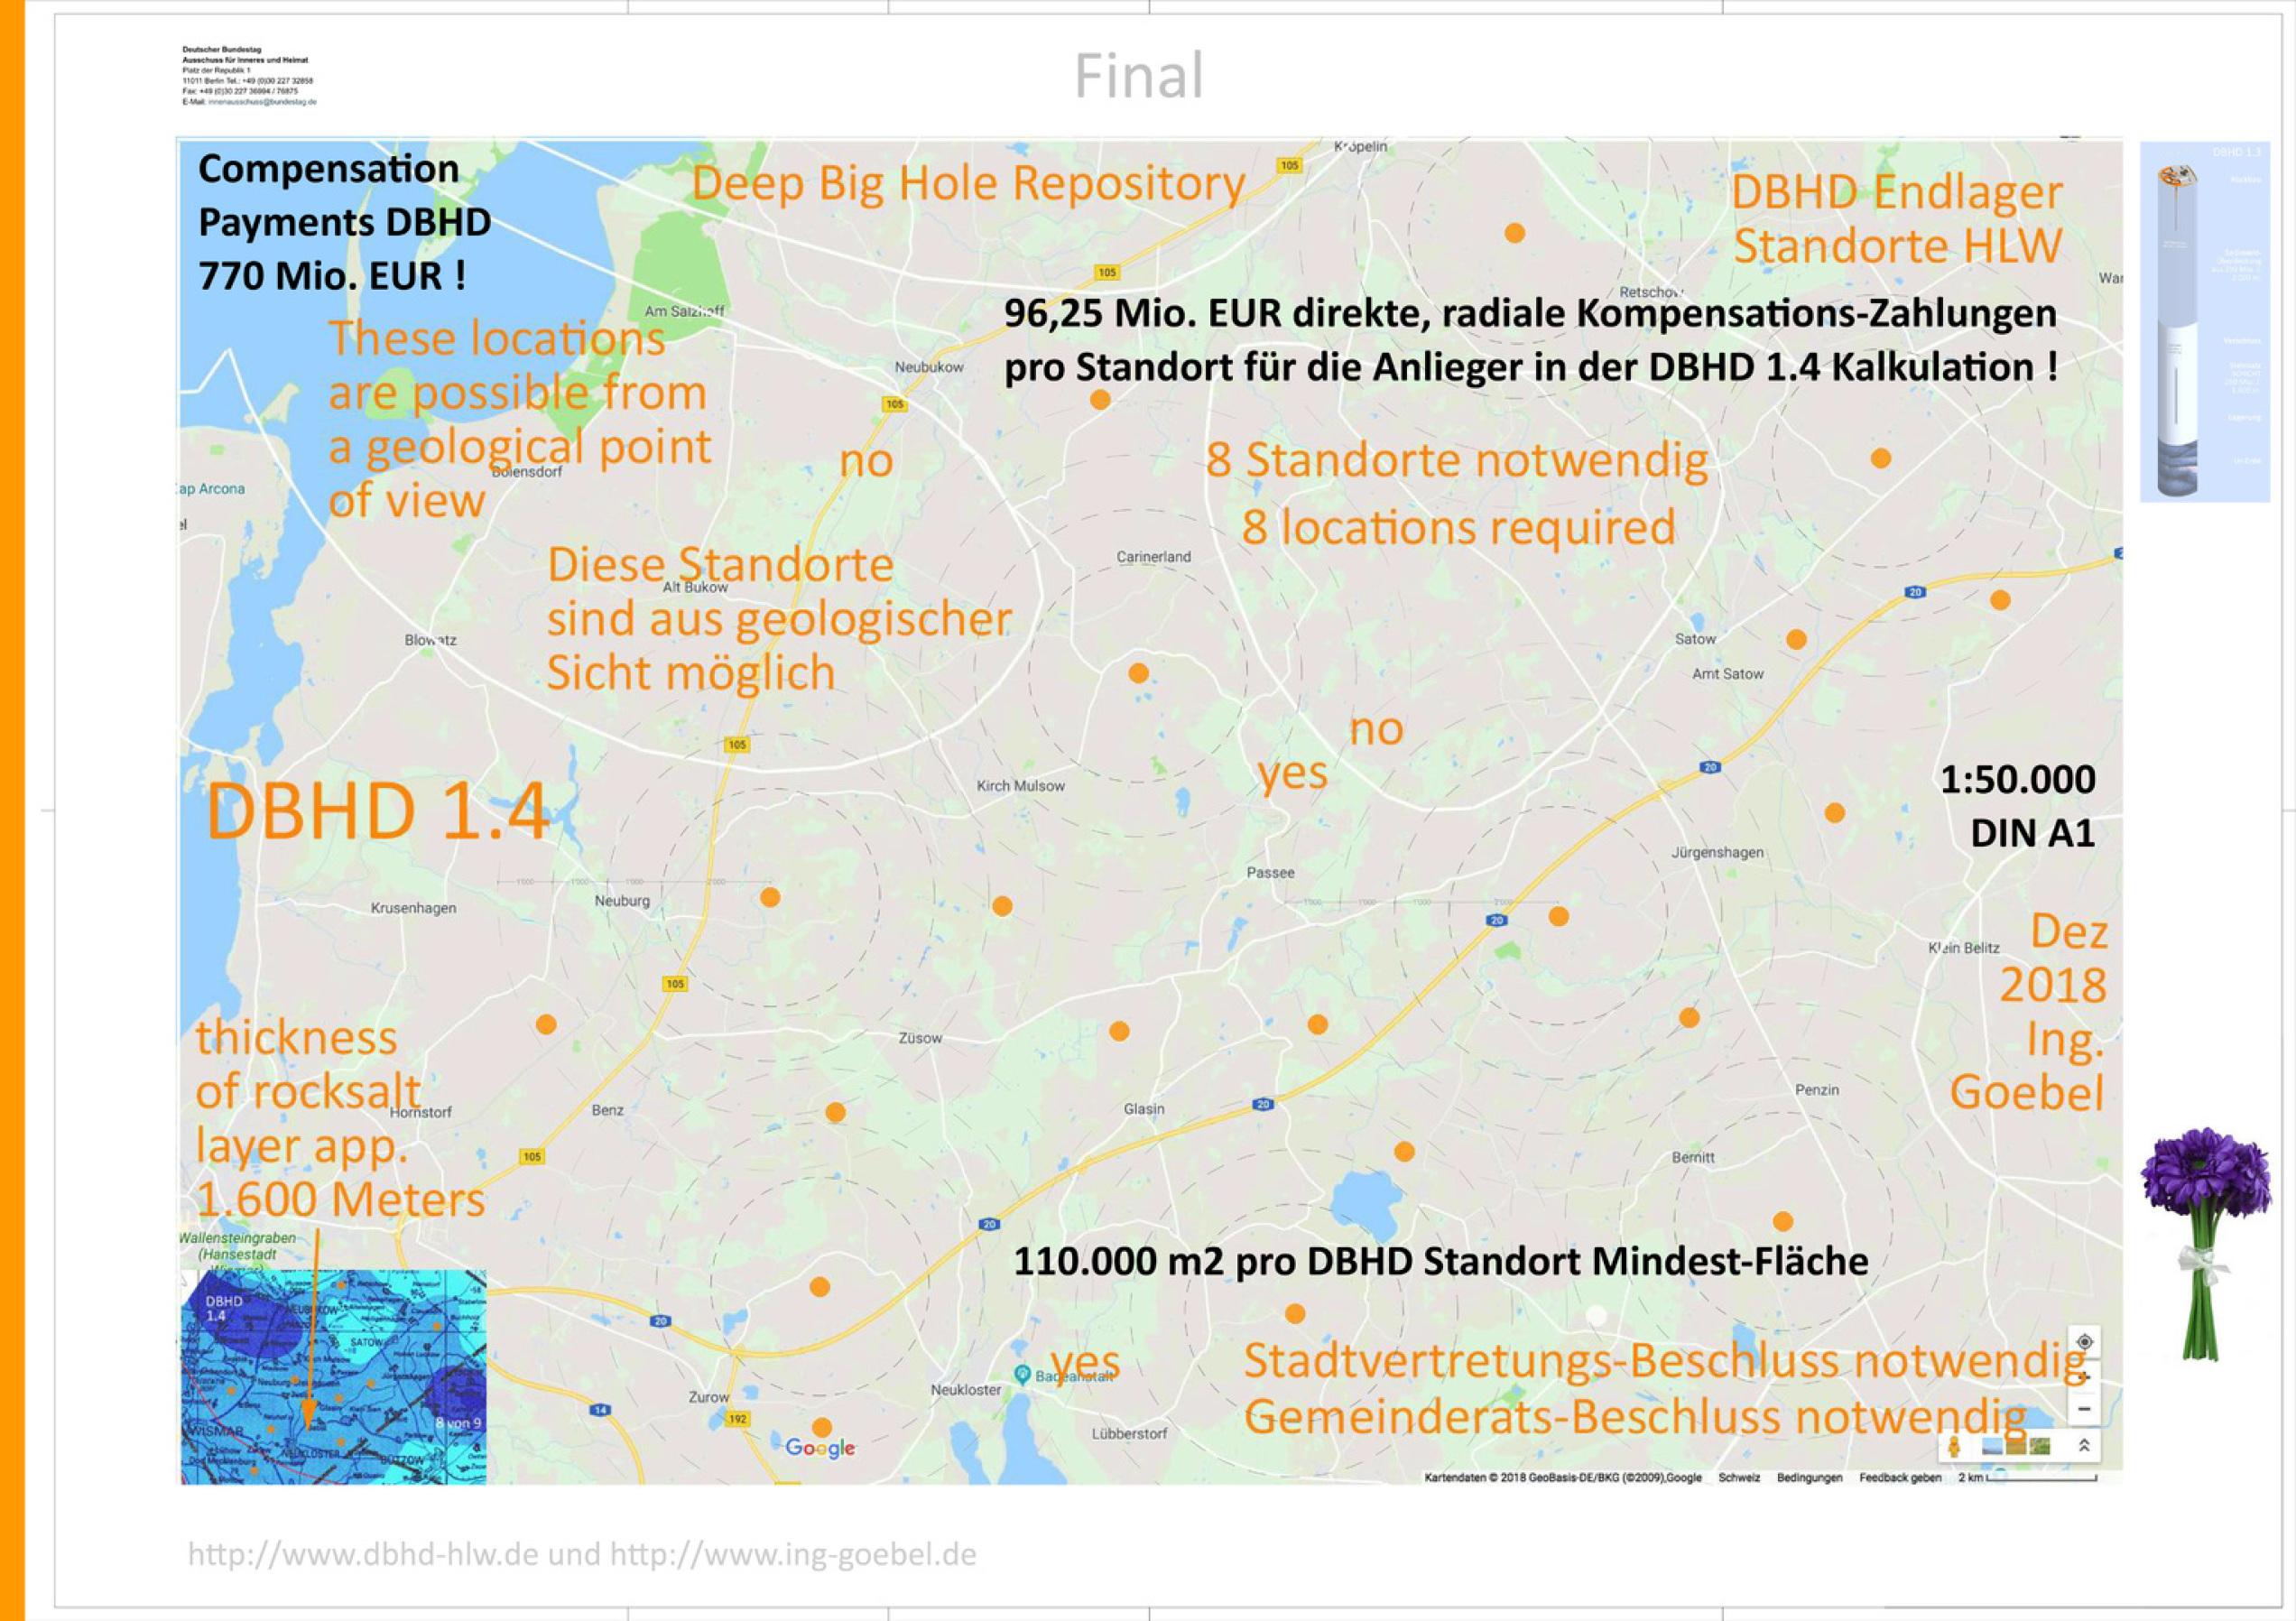 DBHD_1.3_Endlager_Standorte_Kompensationsradien_Karte_ing_Goebel_Basis_Geologische_Karte_auf_Strassenkarte Volker Goebel Endlager